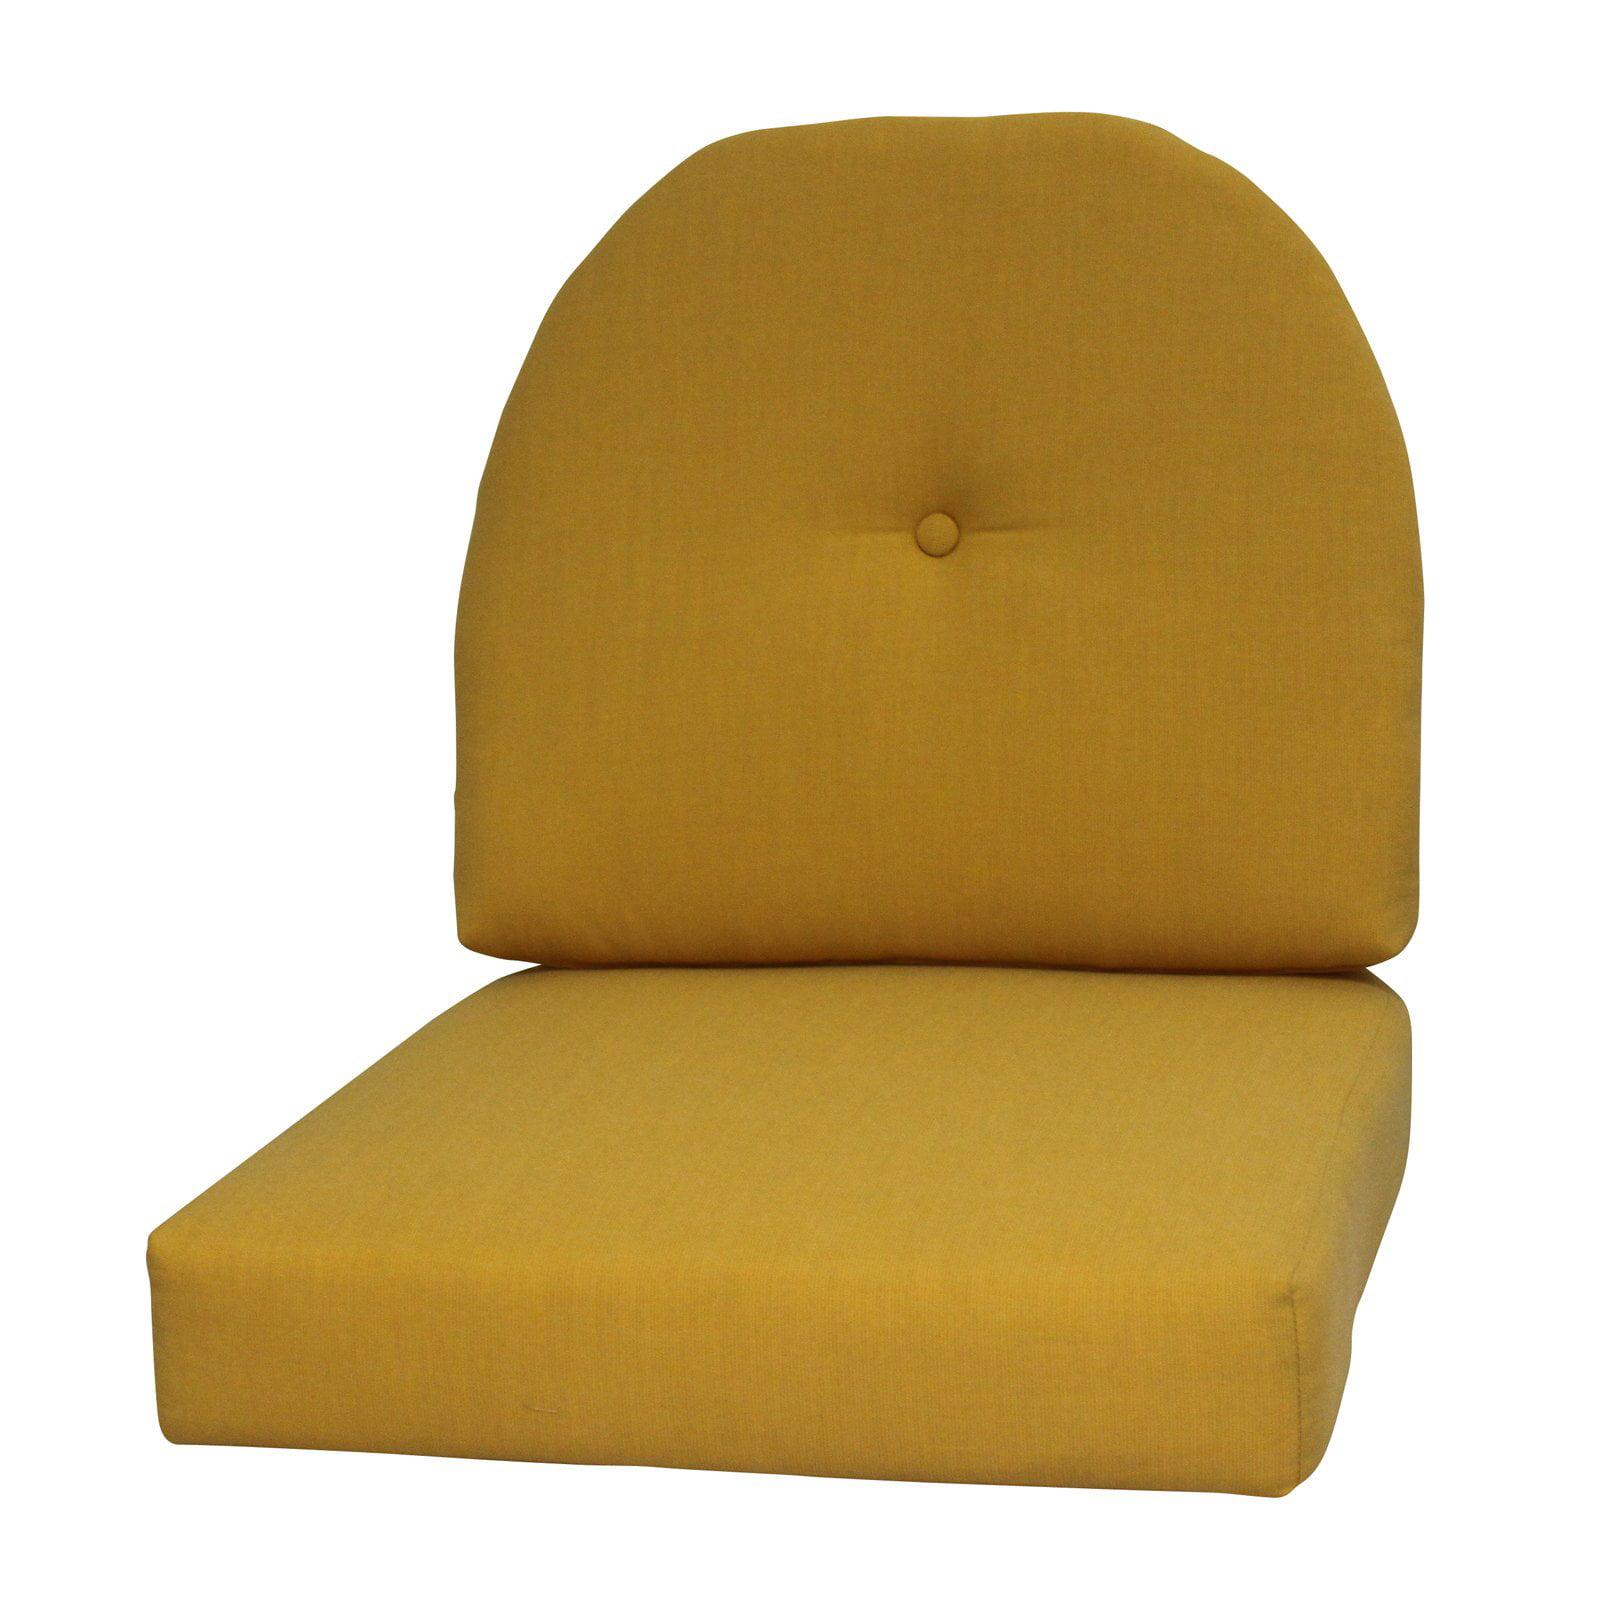 FiberBuilt Paradise Cushions Sunbrella Wicker Chair Seat And Back Cushion    Walmart.com